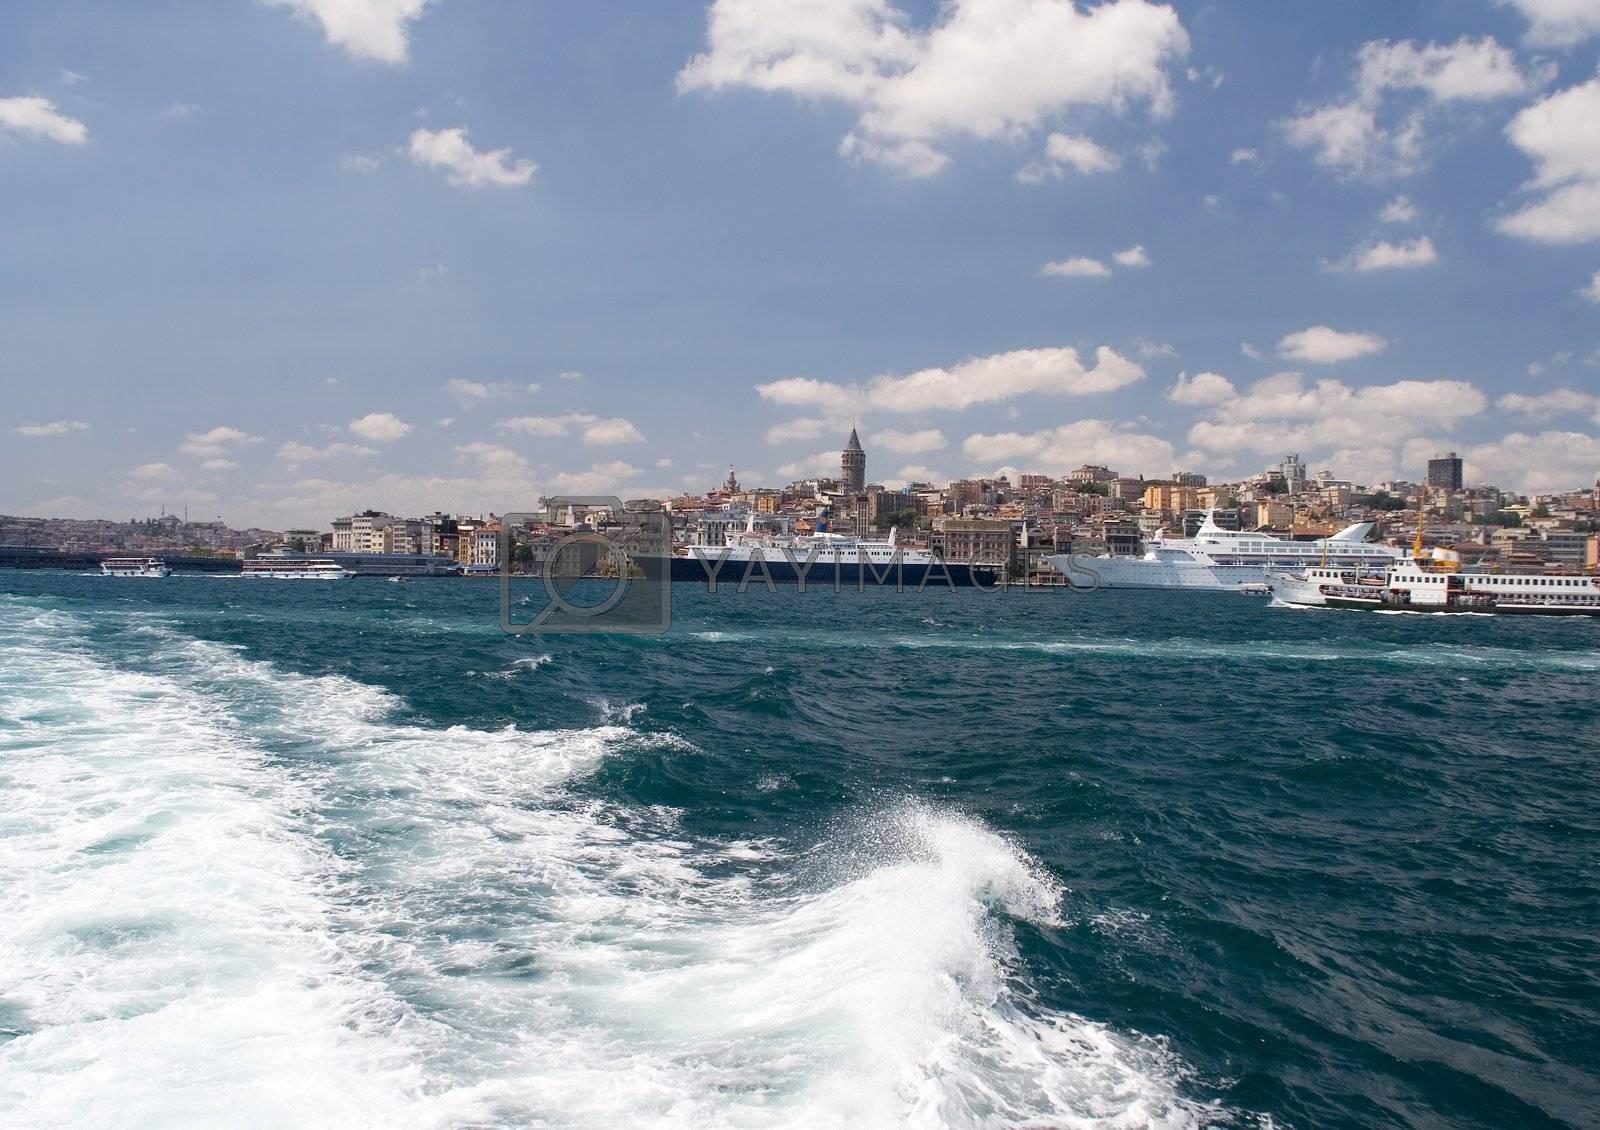 travel ship wave sea vessel industrial  landscape